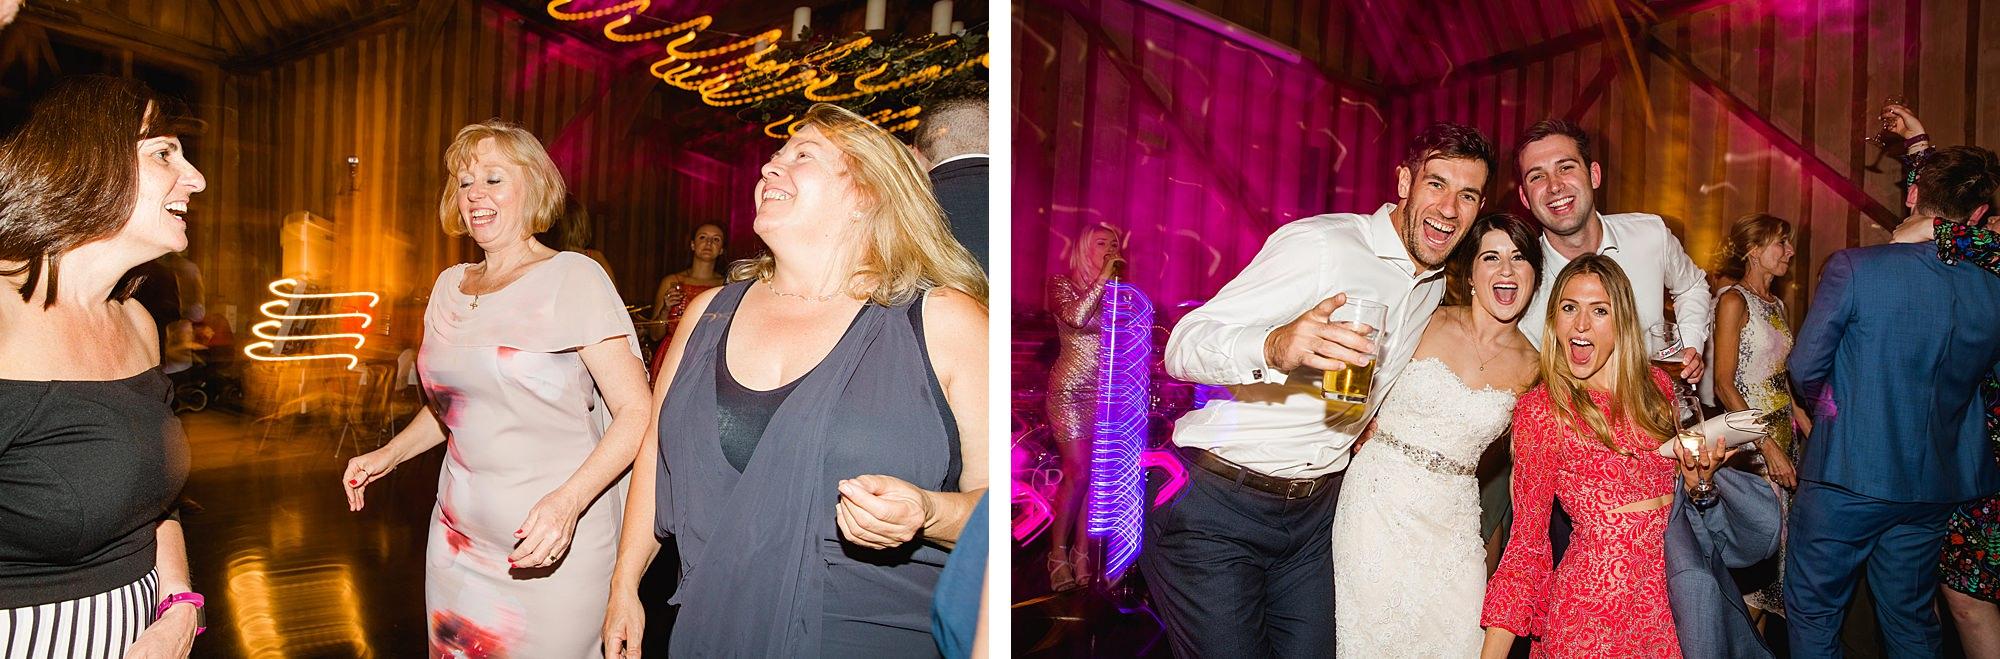 Lillibrooke Manor wedding dancing guests